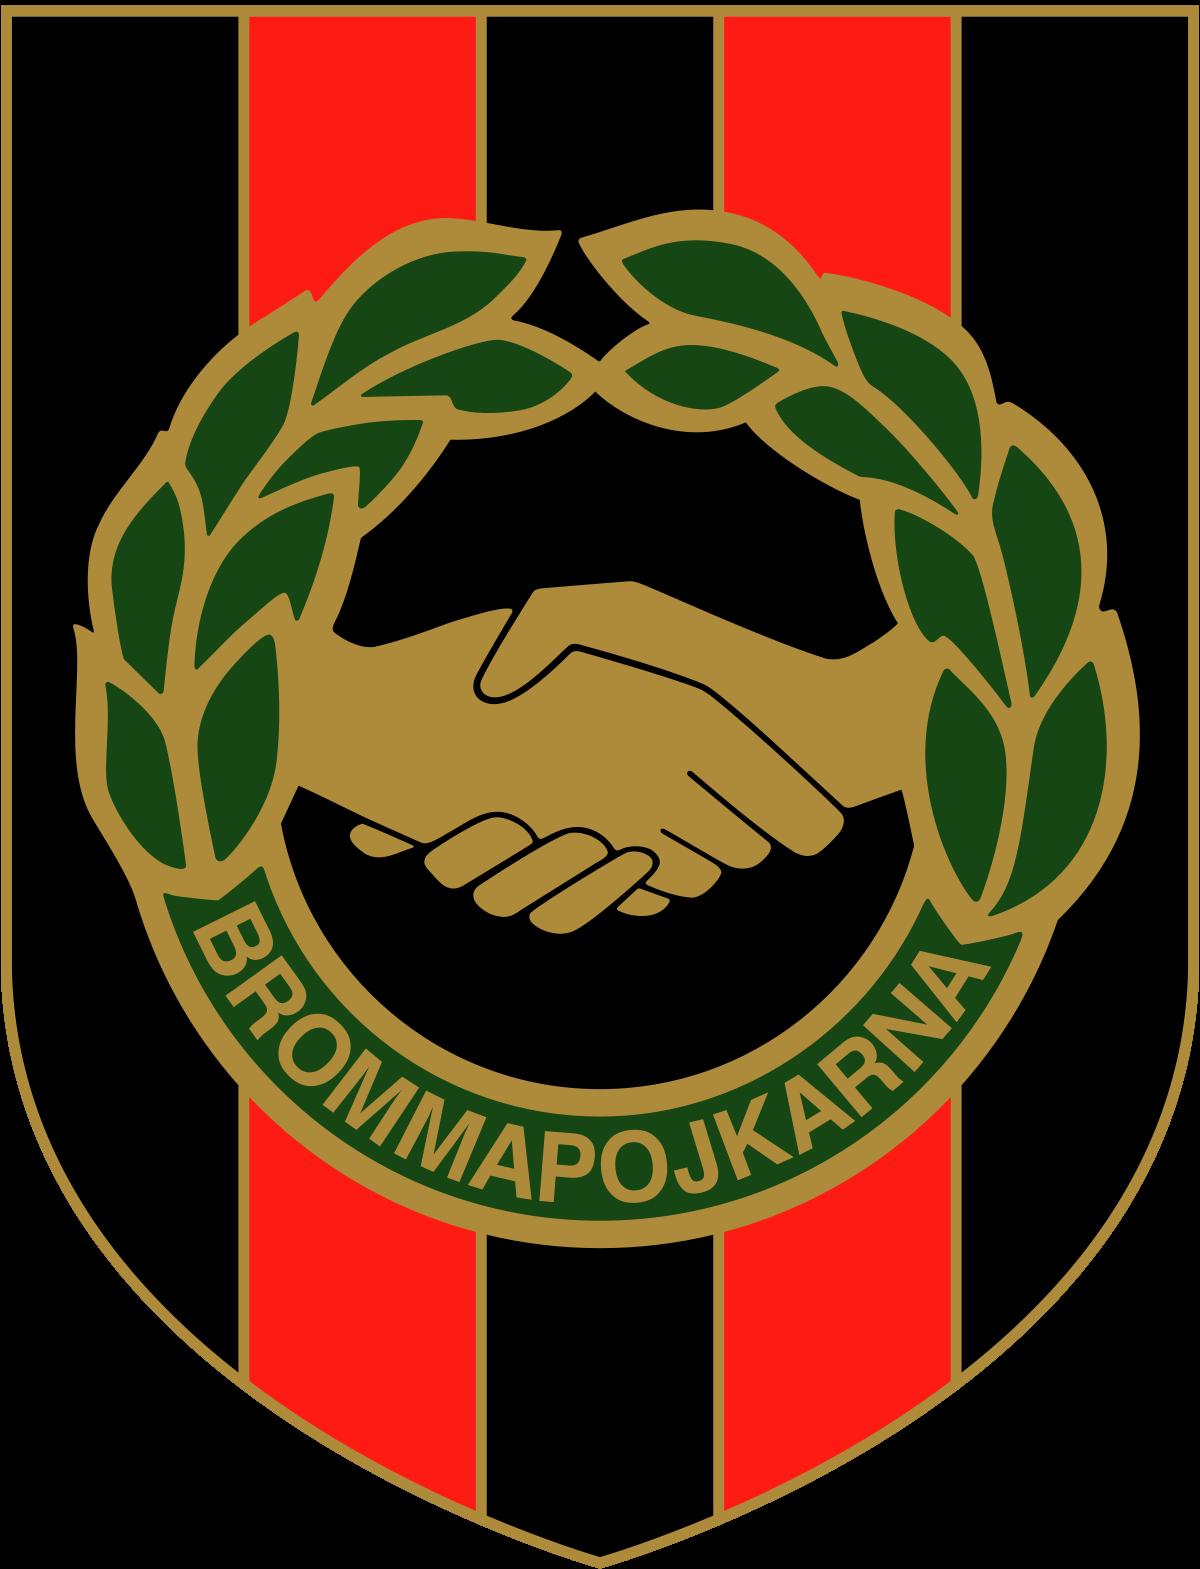 If Brommapojkarna Logo Allsvenskan Sweden Football Logo Sweden Football Logos